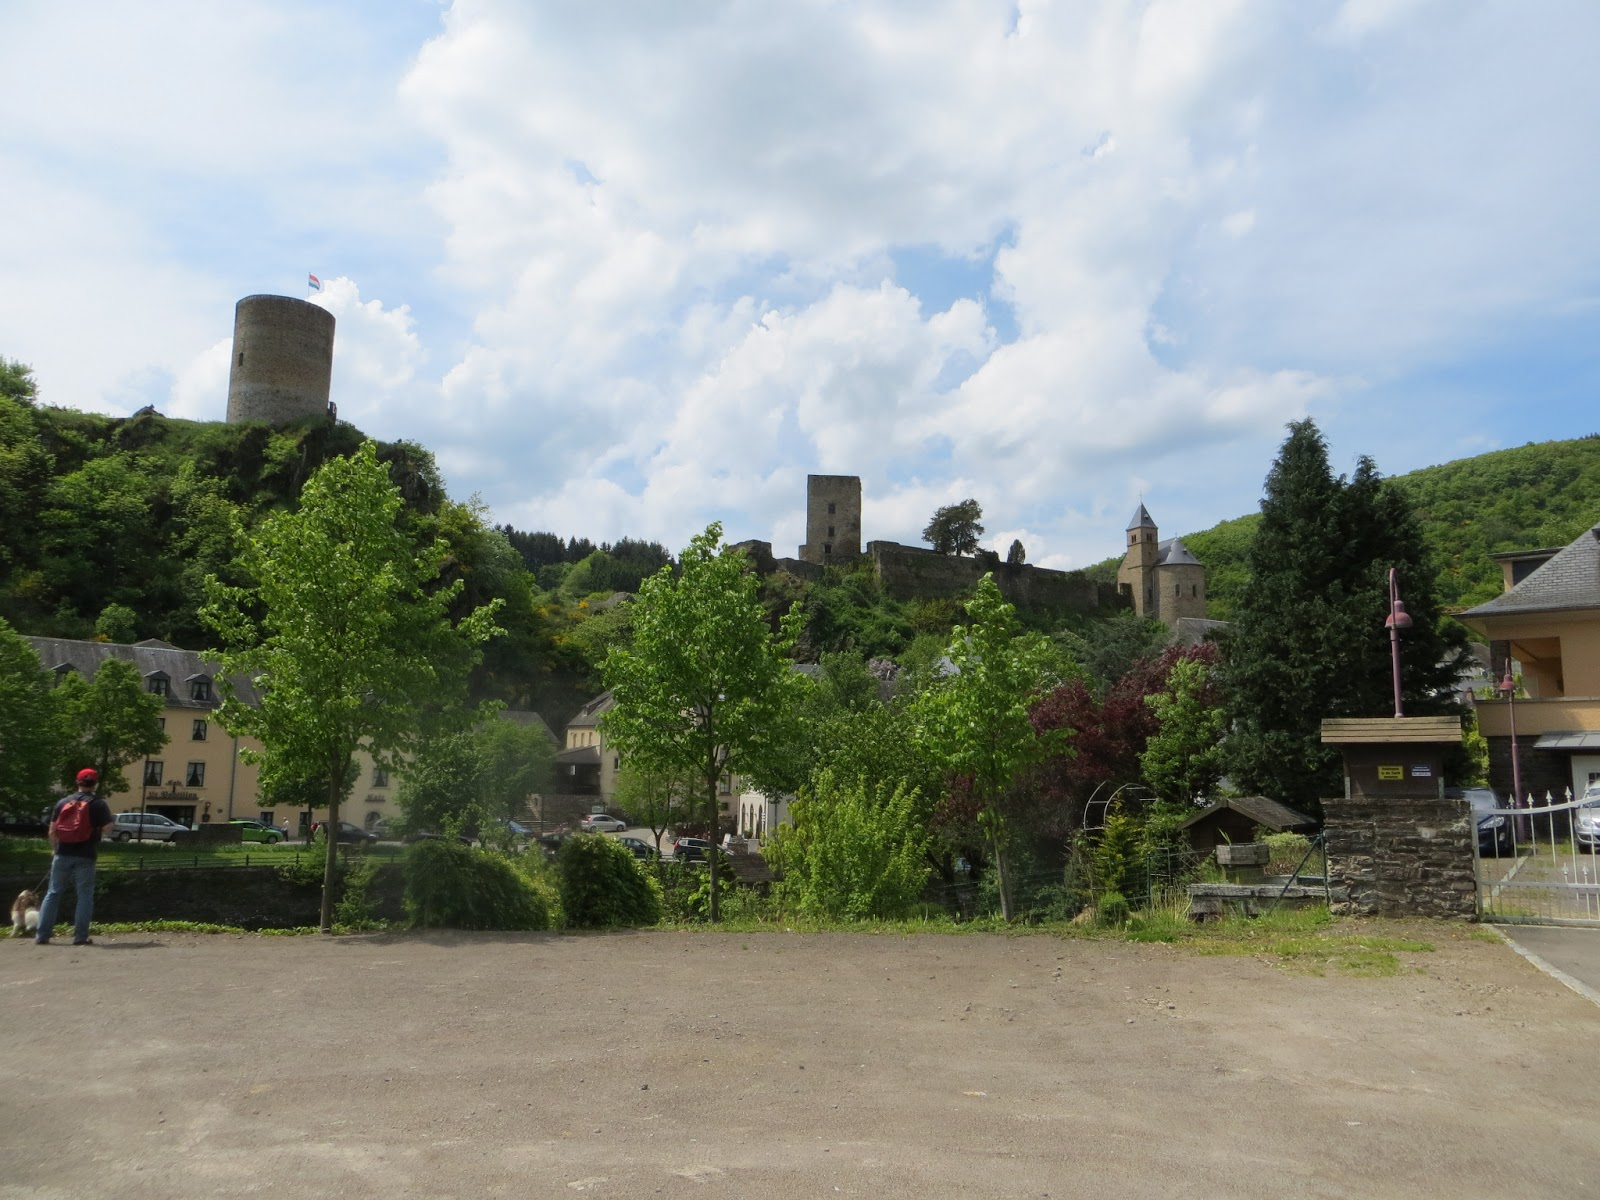 Aagdoetverslag vakantie luxemburg 3 for Vakantie luxemburg